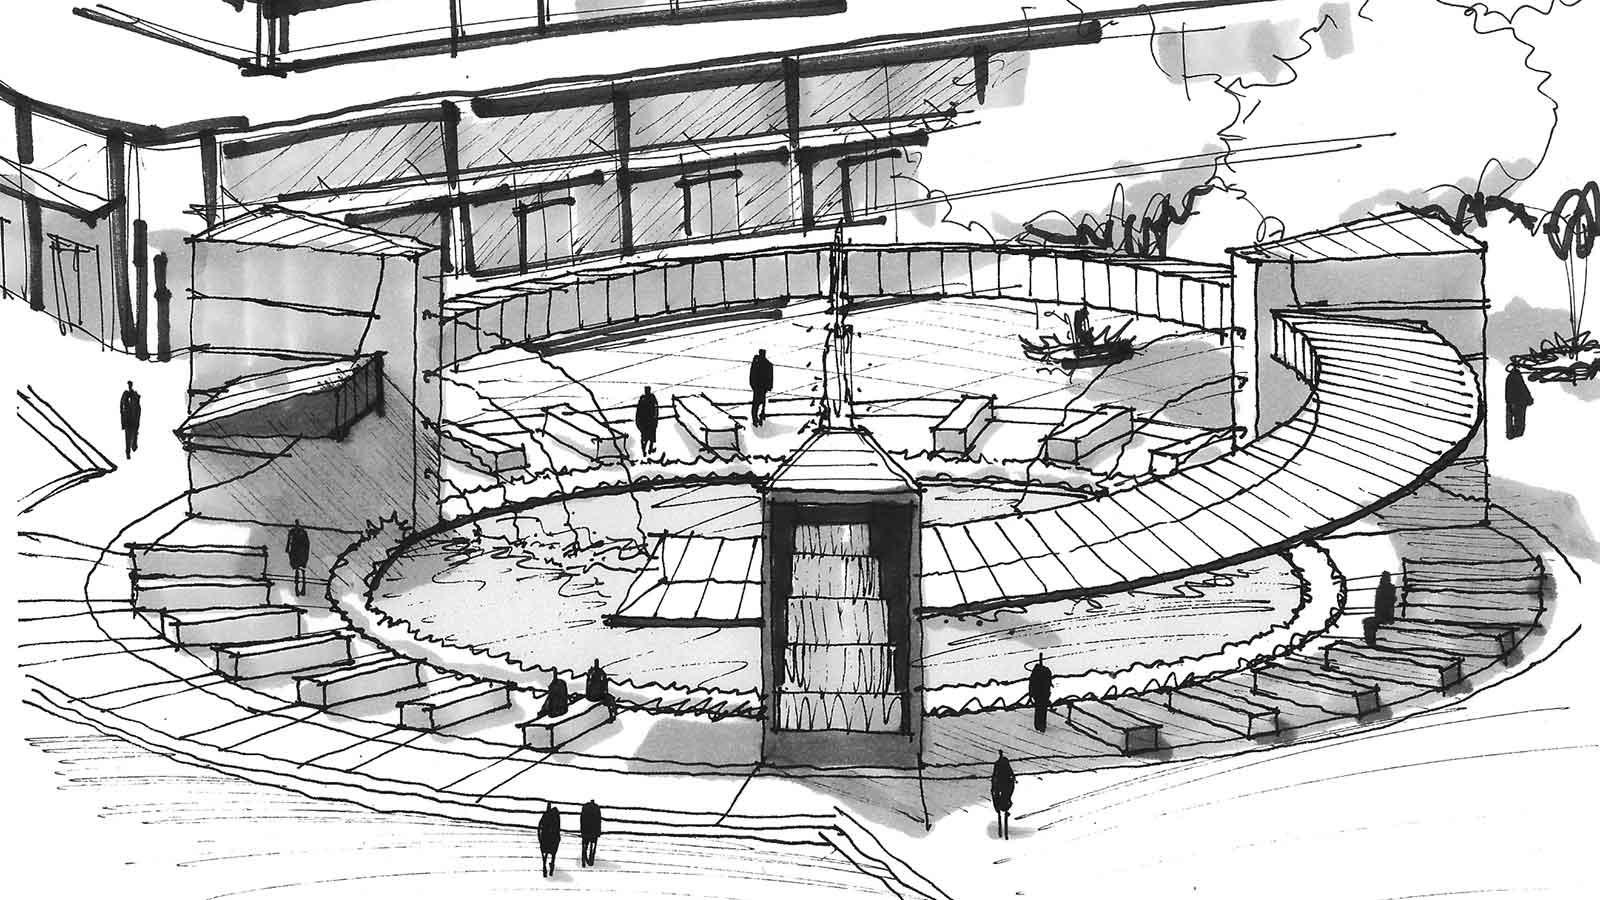 ddla-design_conceptual-china-plaza-sketch.jpg